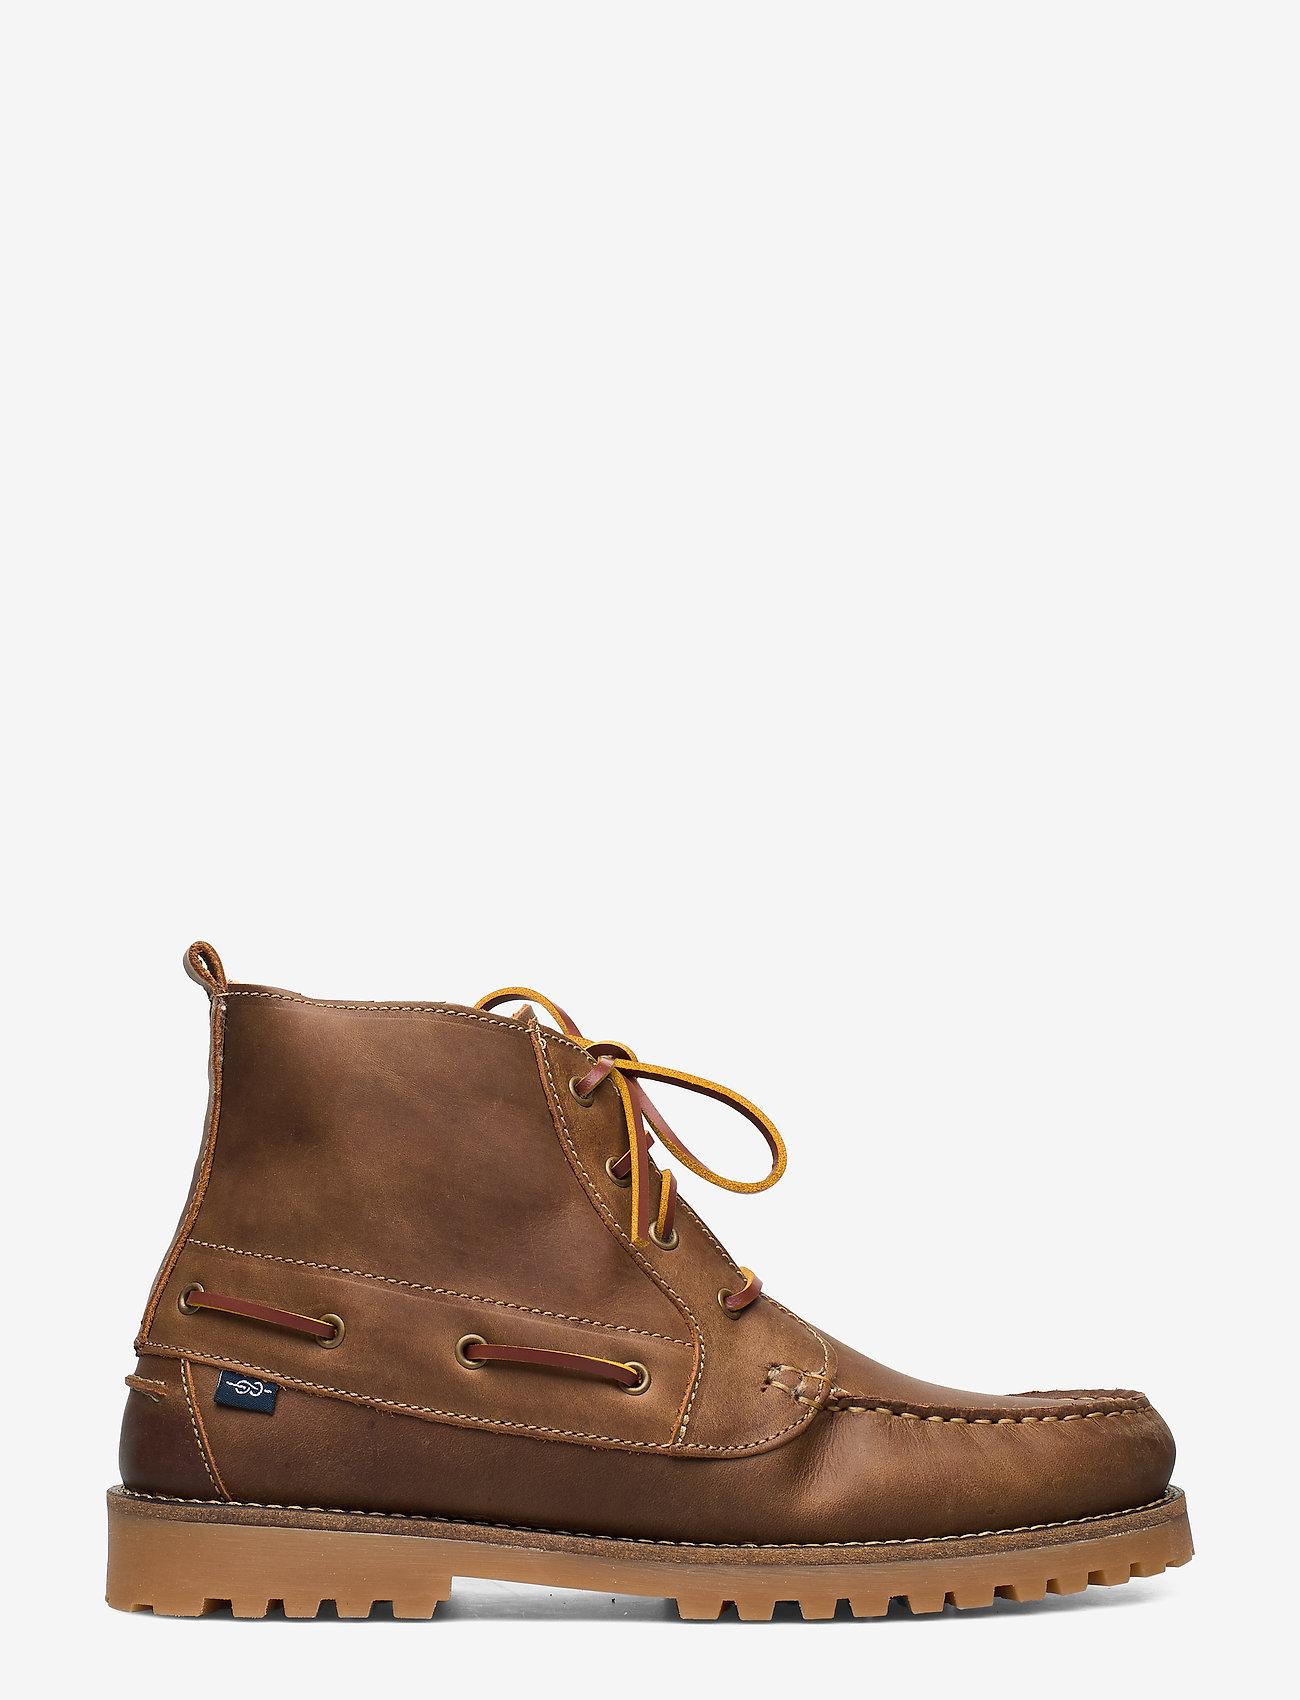 Marstrand - ROUGH 4-EYE WARM MARSTRAND KÄNGA - vinter boots - taupe - 1